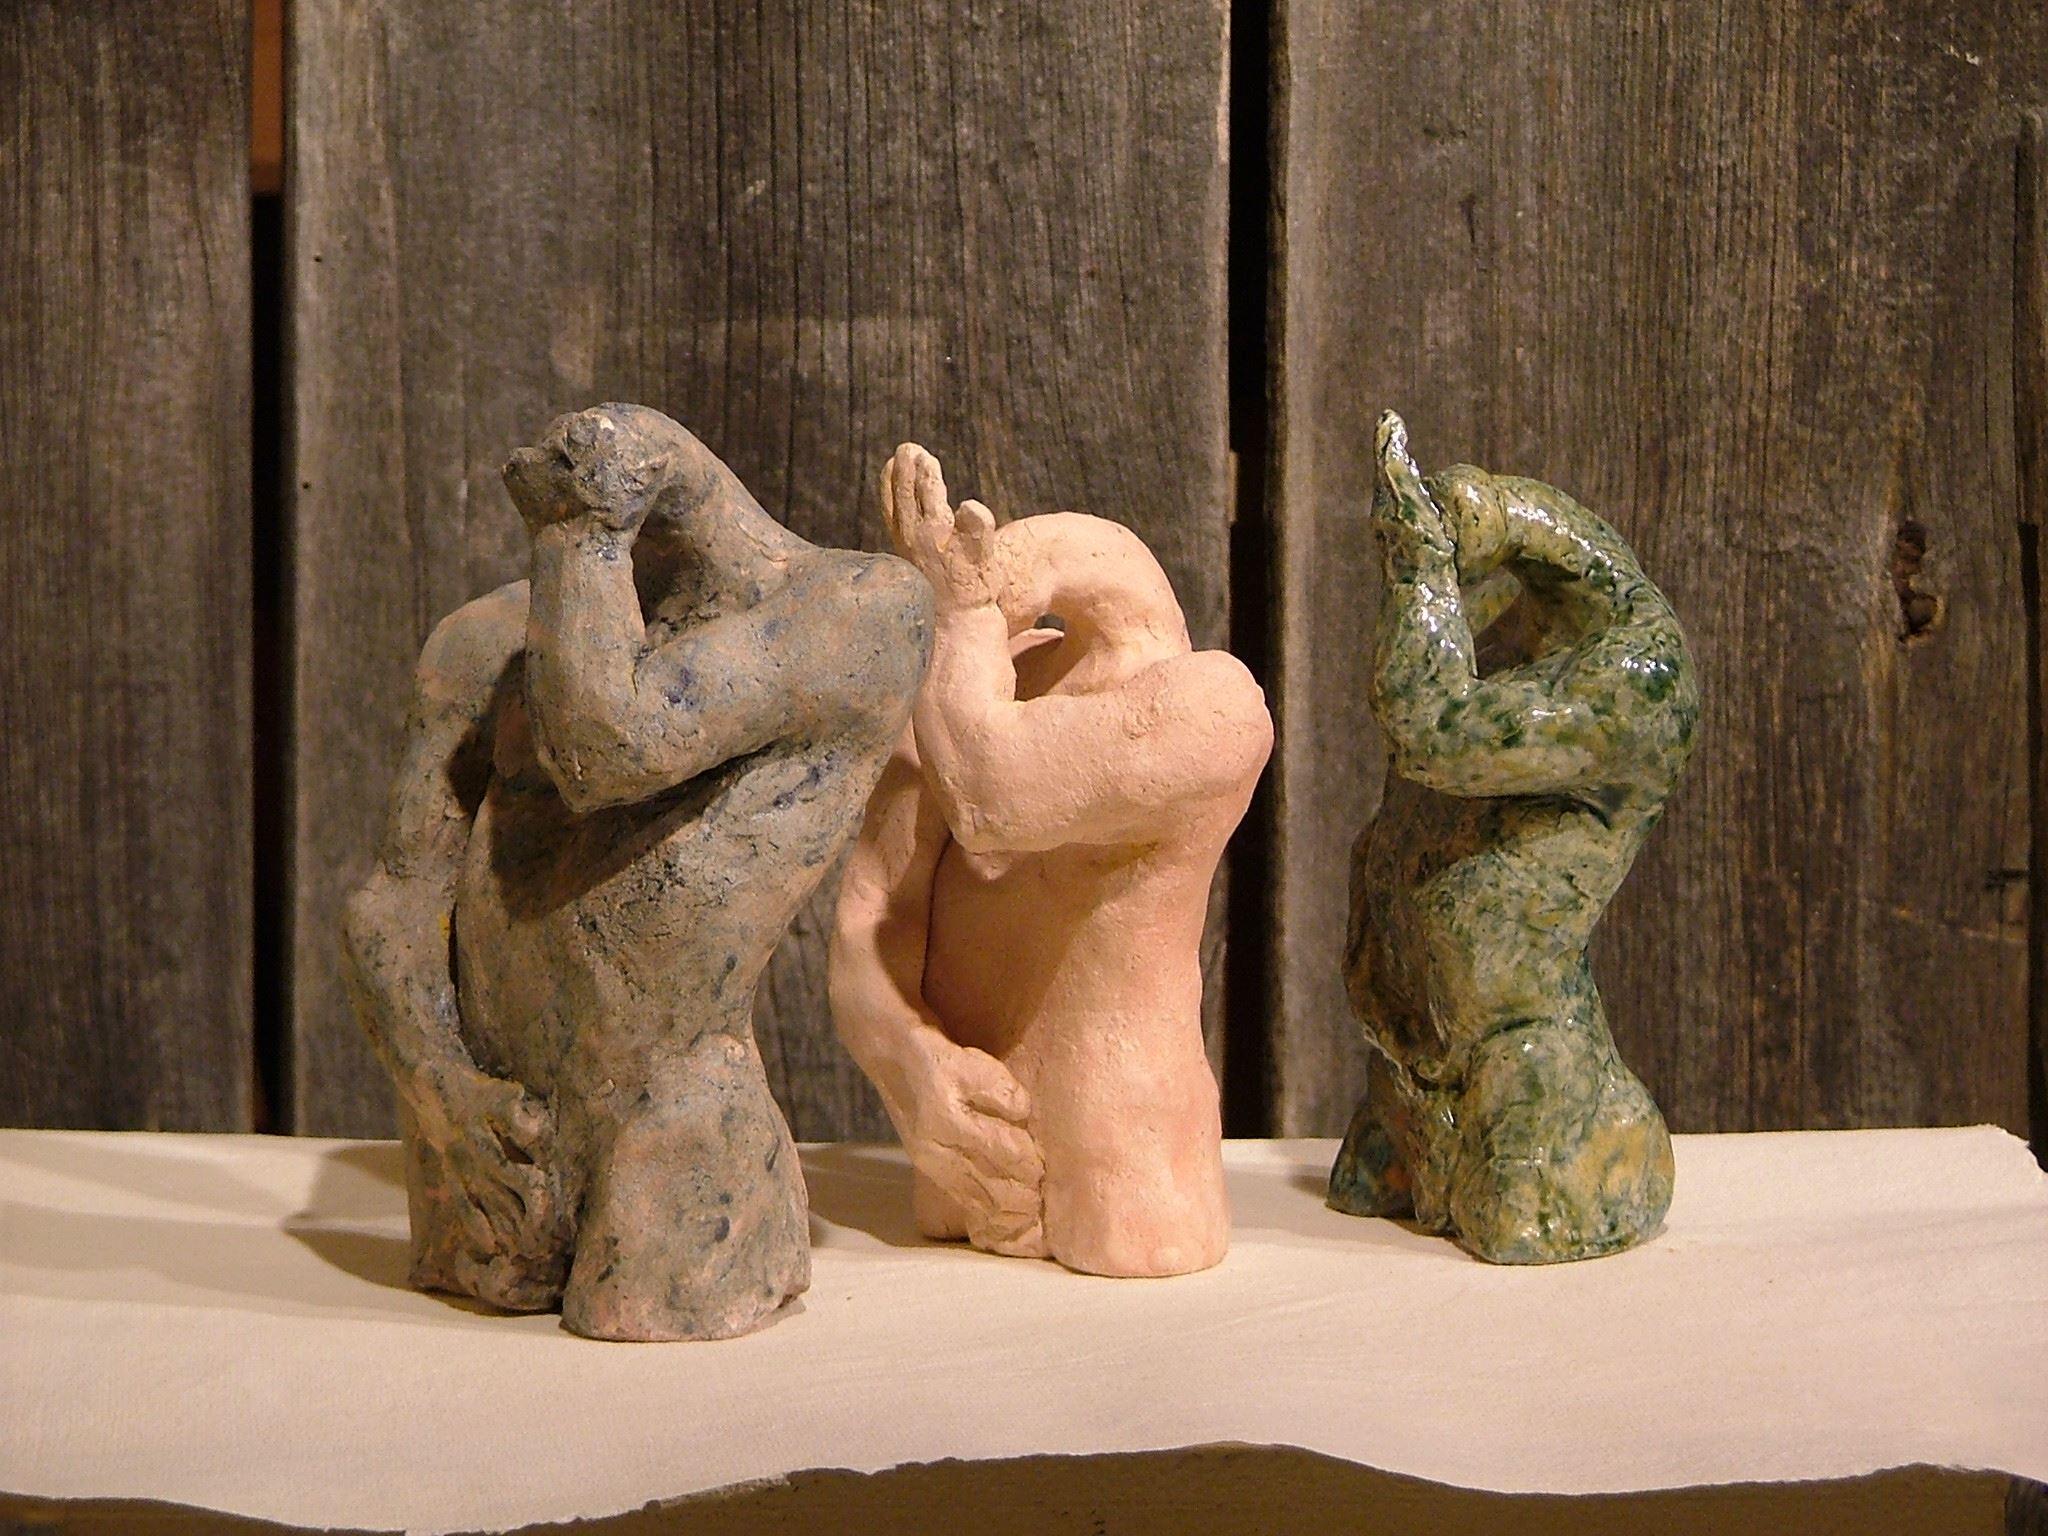 Foto: Urban Berglund, Skulpturum i Ammarnäs